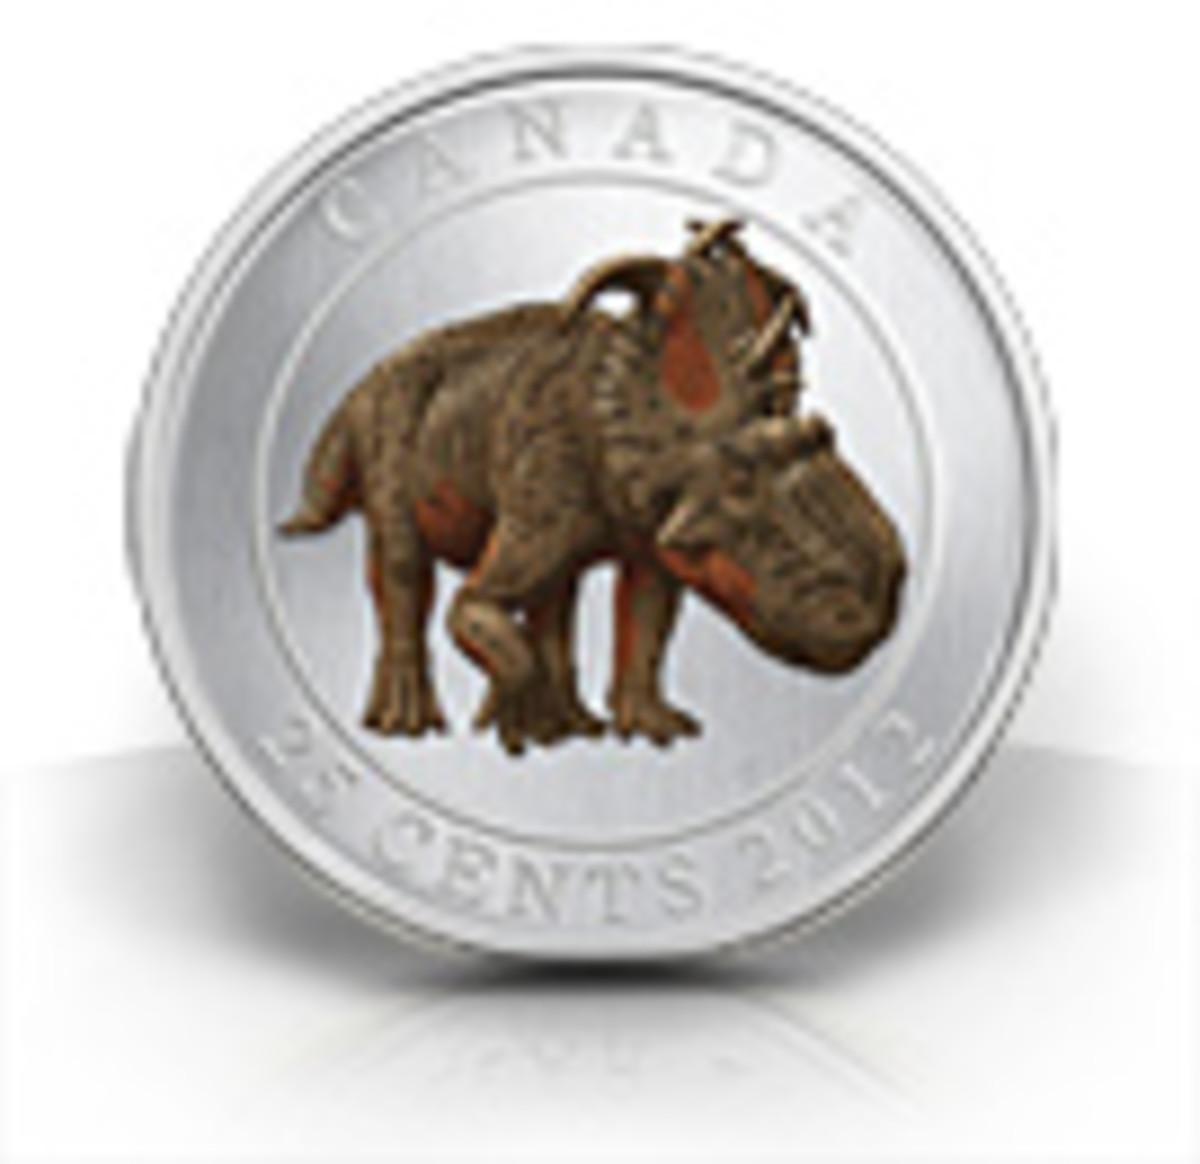 Glow-in-the-dark dinosaur coin